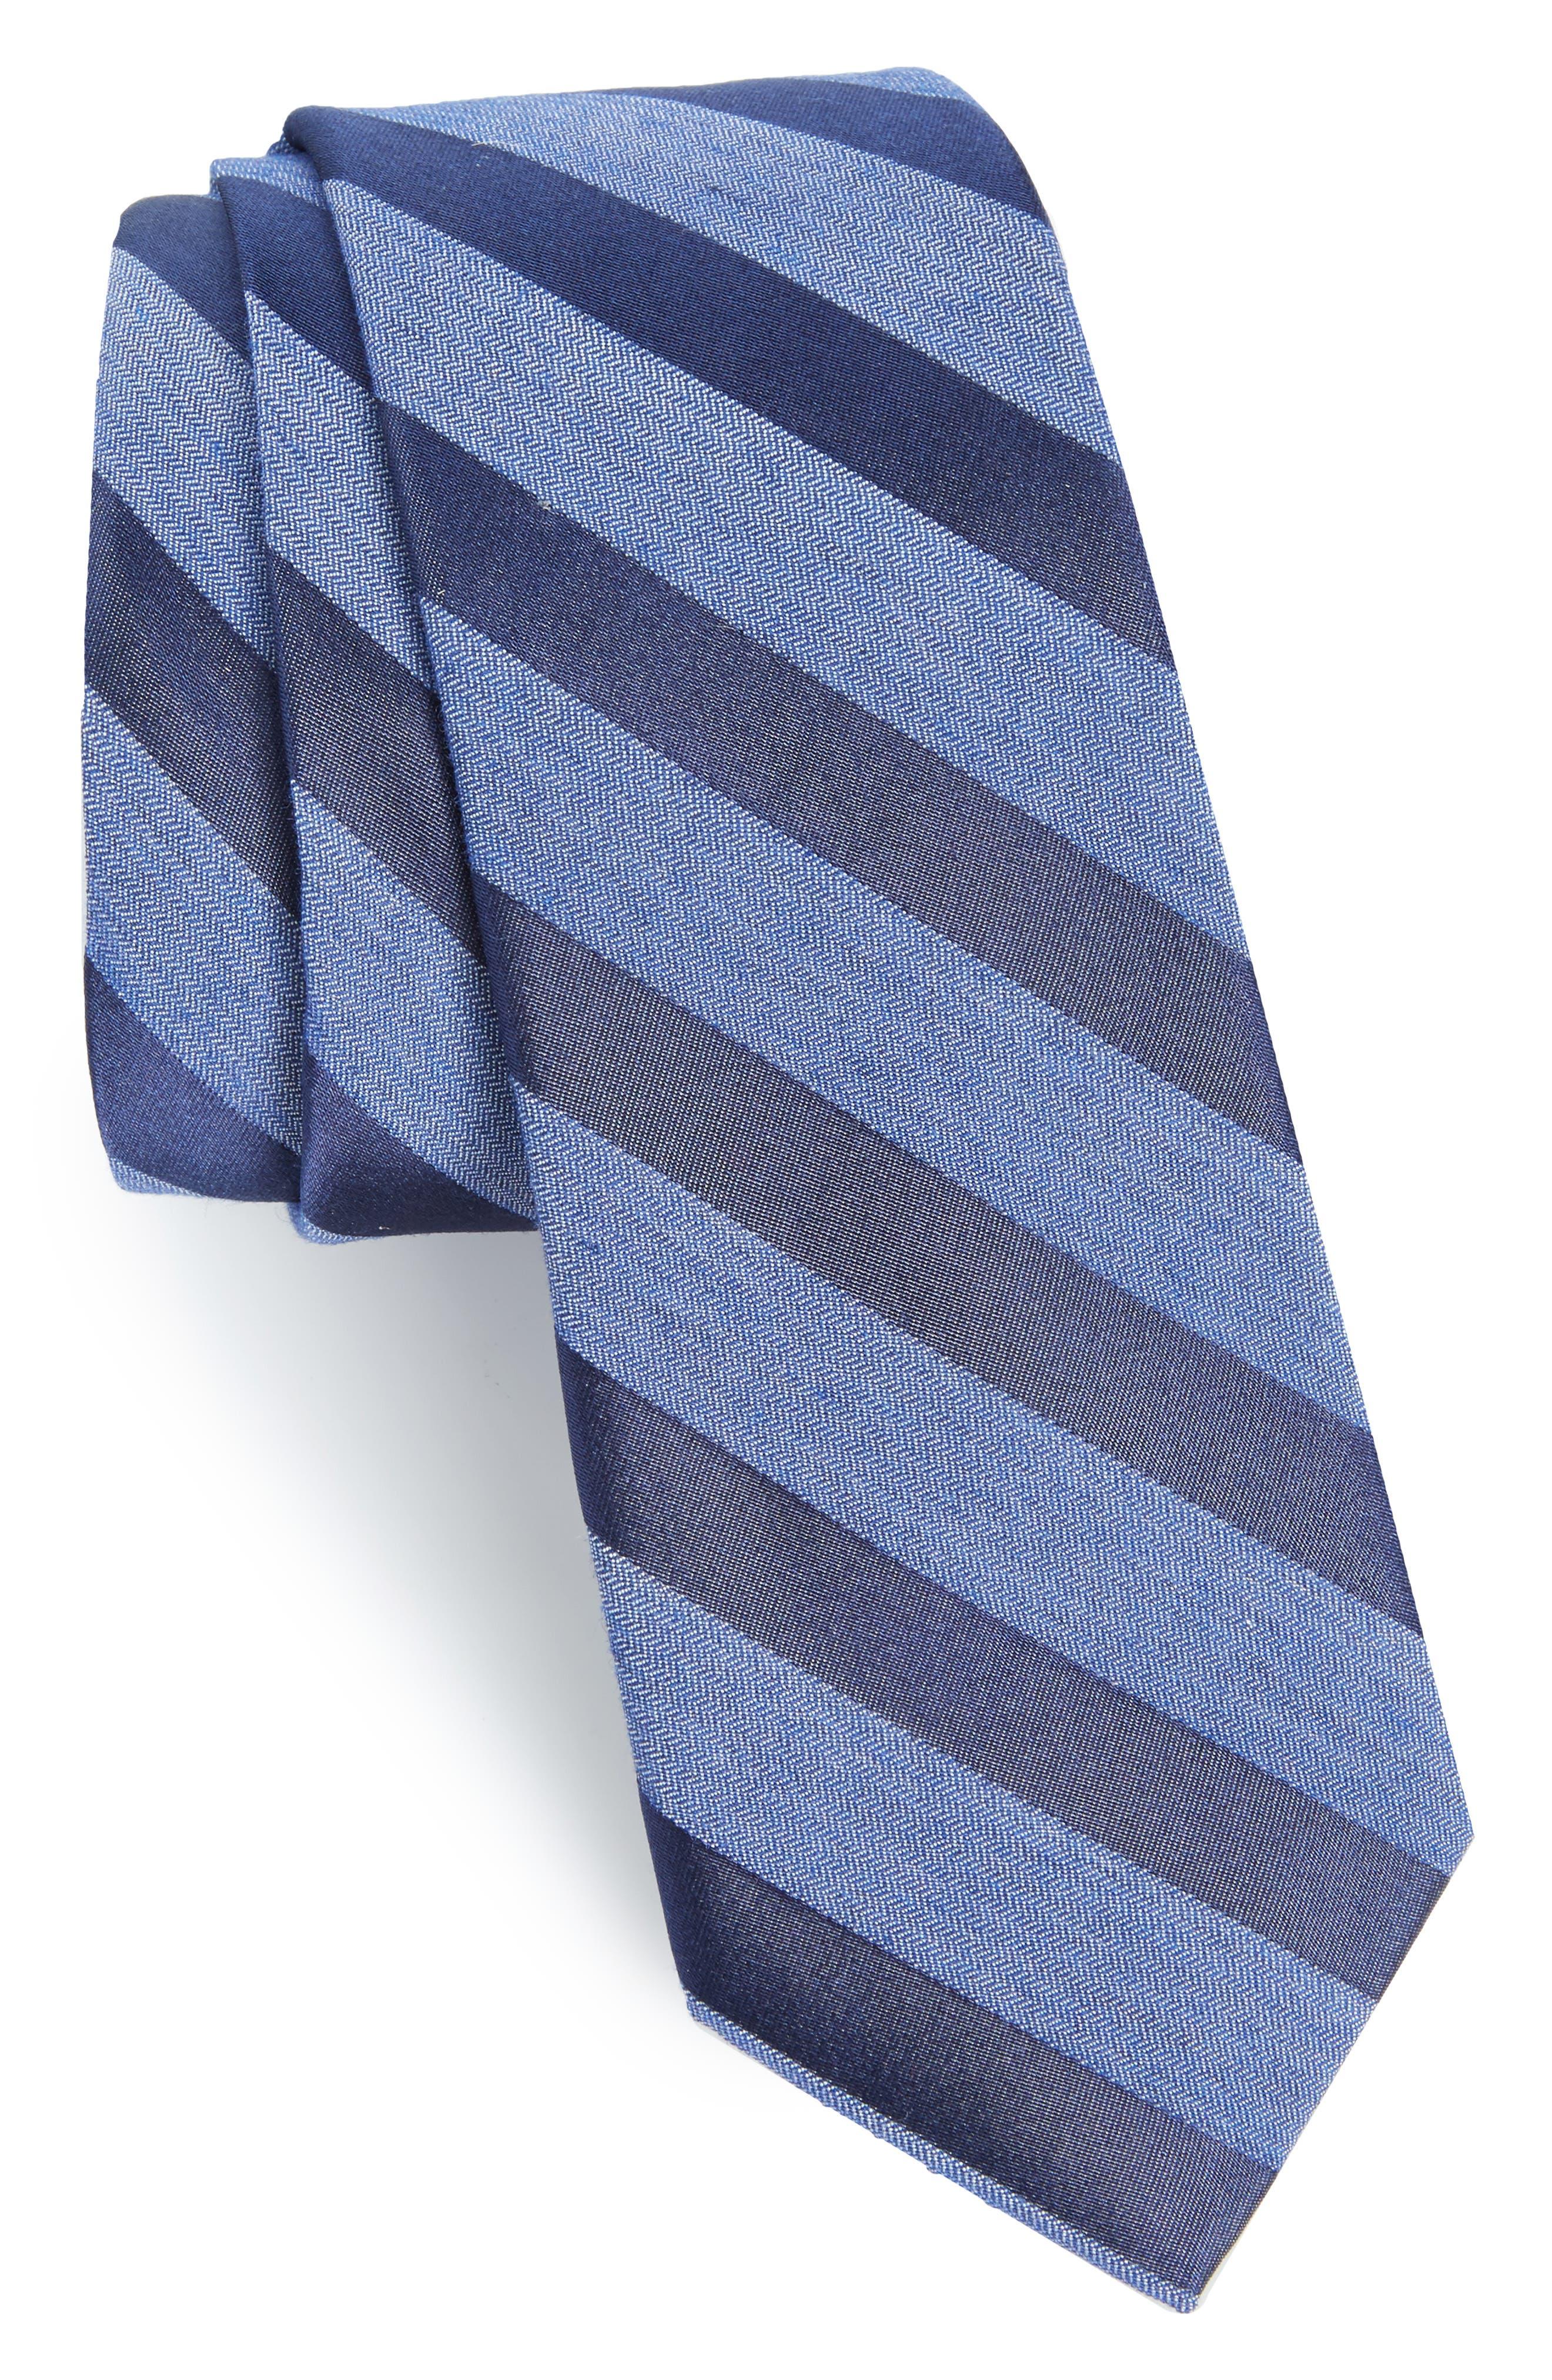 Bar Stripe Silk Blend Skinny Tie,                         Main,                         color, 411